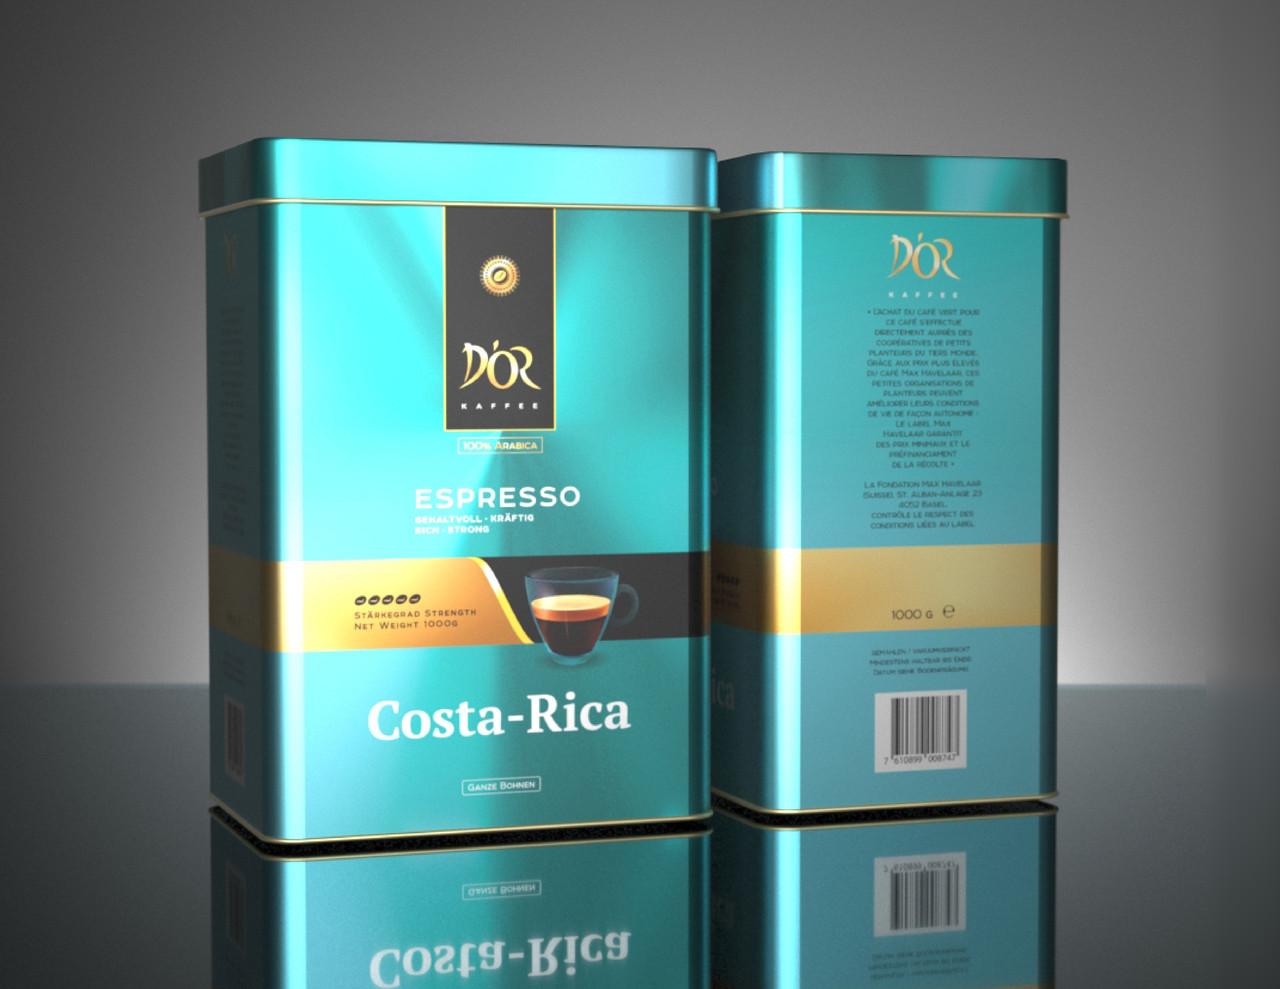 DOR Espresso Сosta-Rica 1 кг. зерно